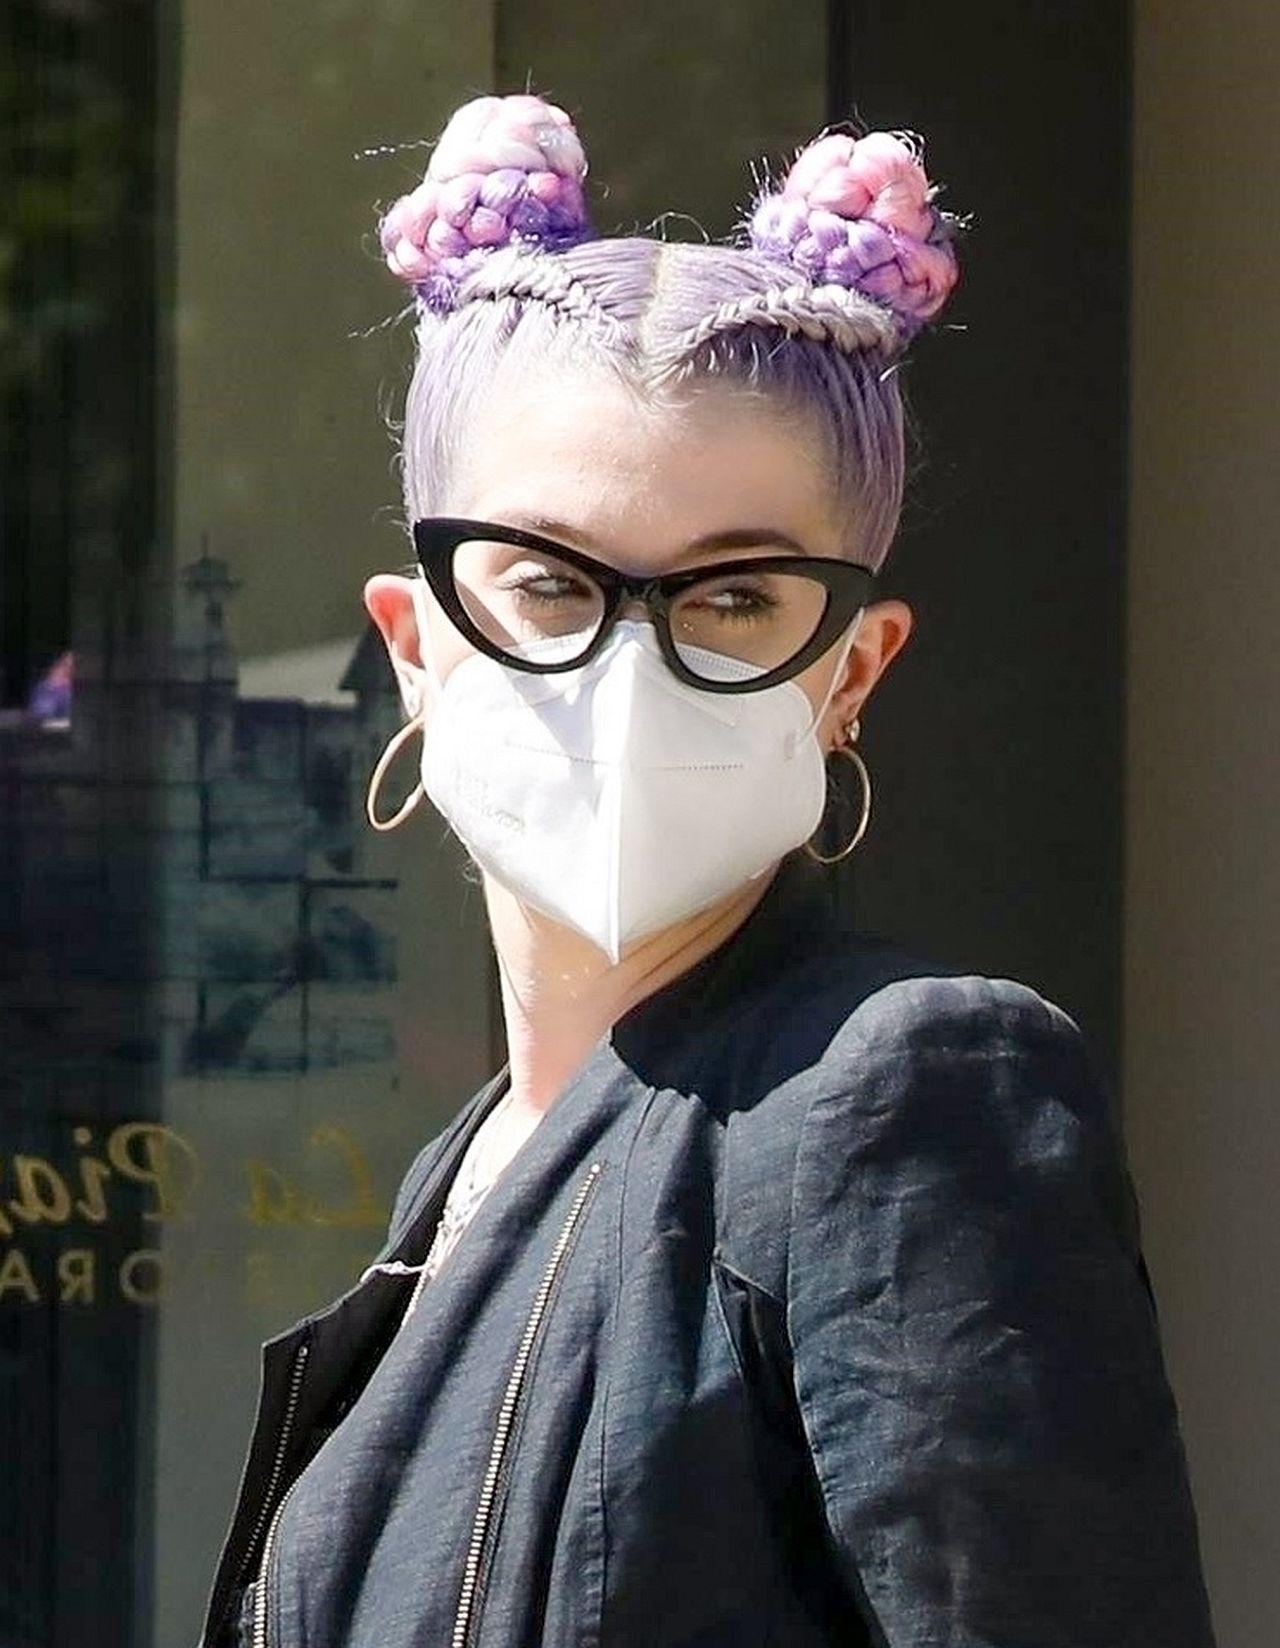 Odchudzona Kelly Osbourne